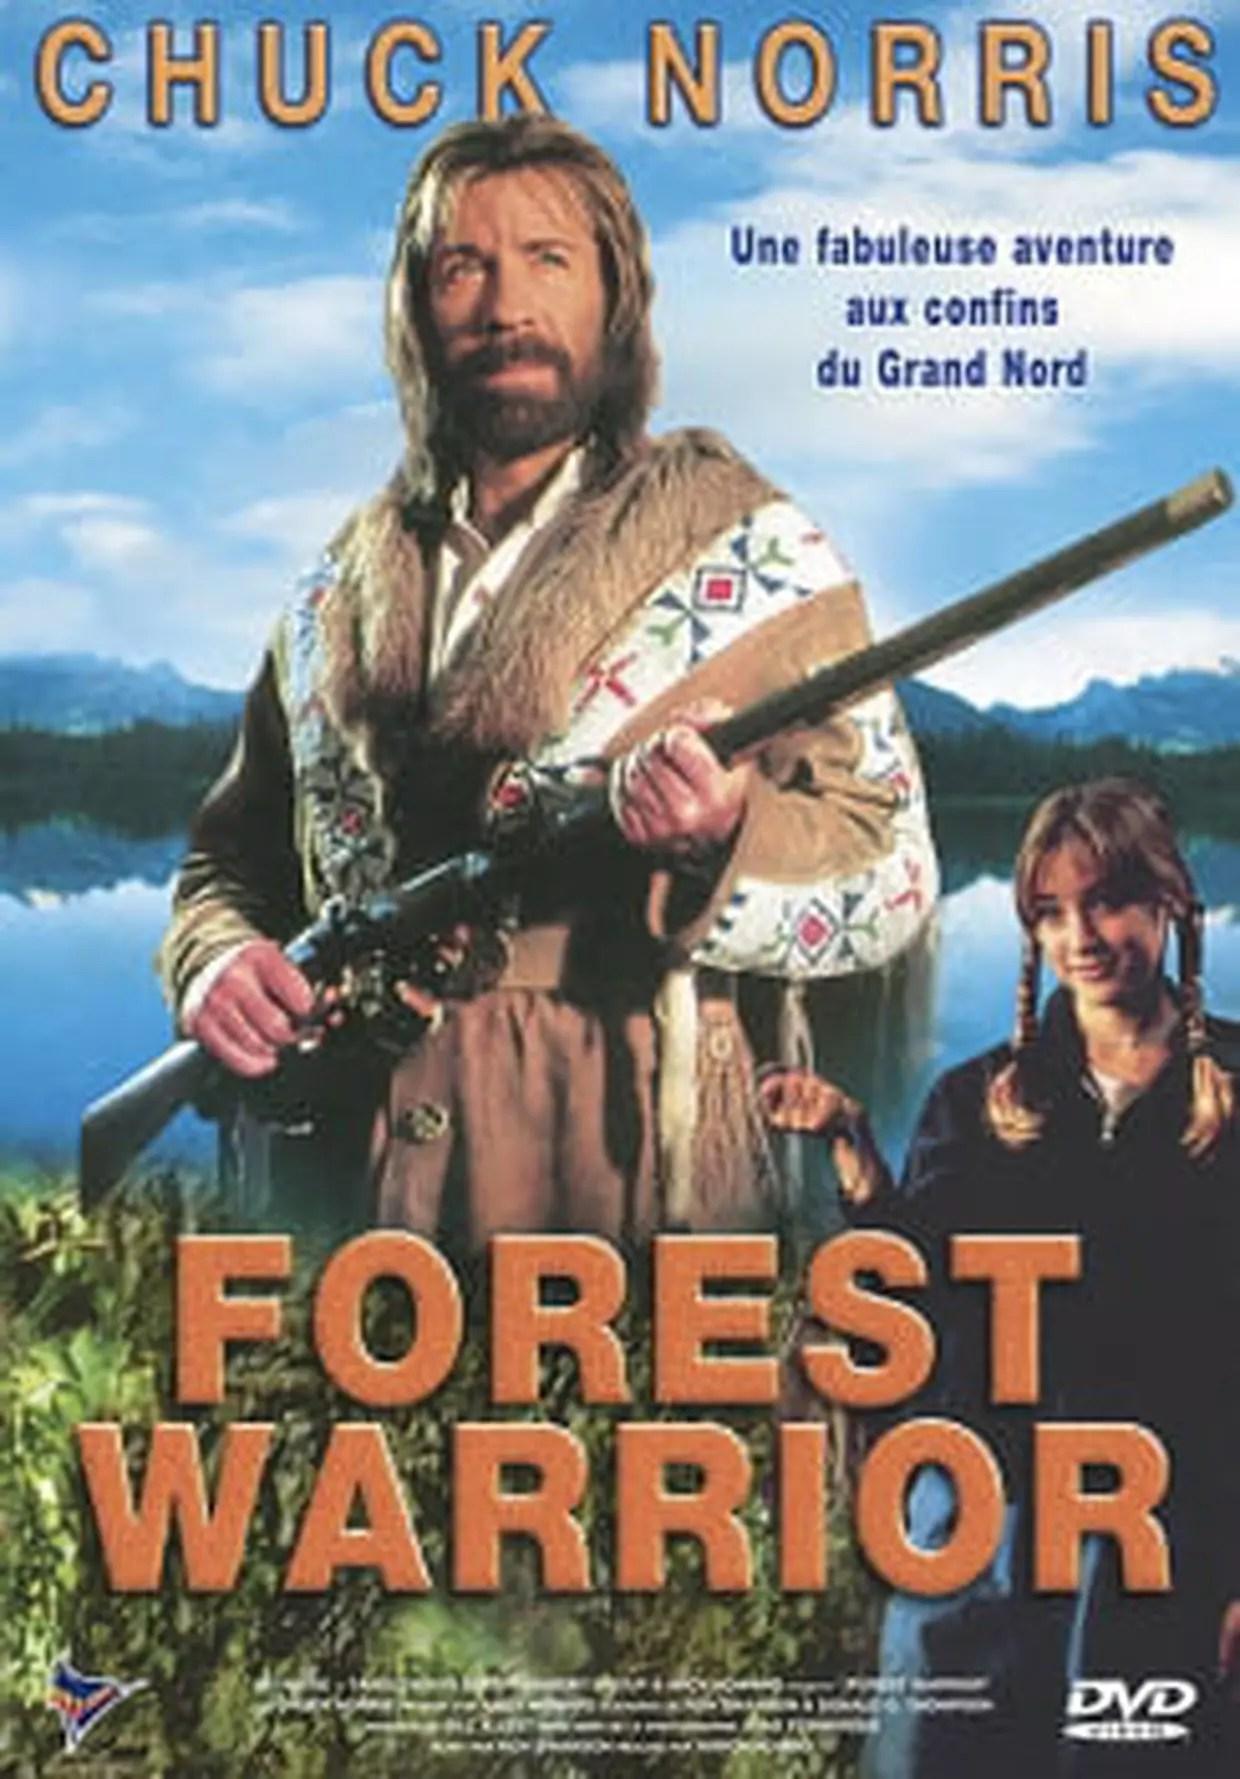 Chuck Norris Films Et Programmes Tv : chuck, norris, films, programmes, Forest, Warrior, Bande, Annonce, Film,, Séances,, Streaming,, Sortie,